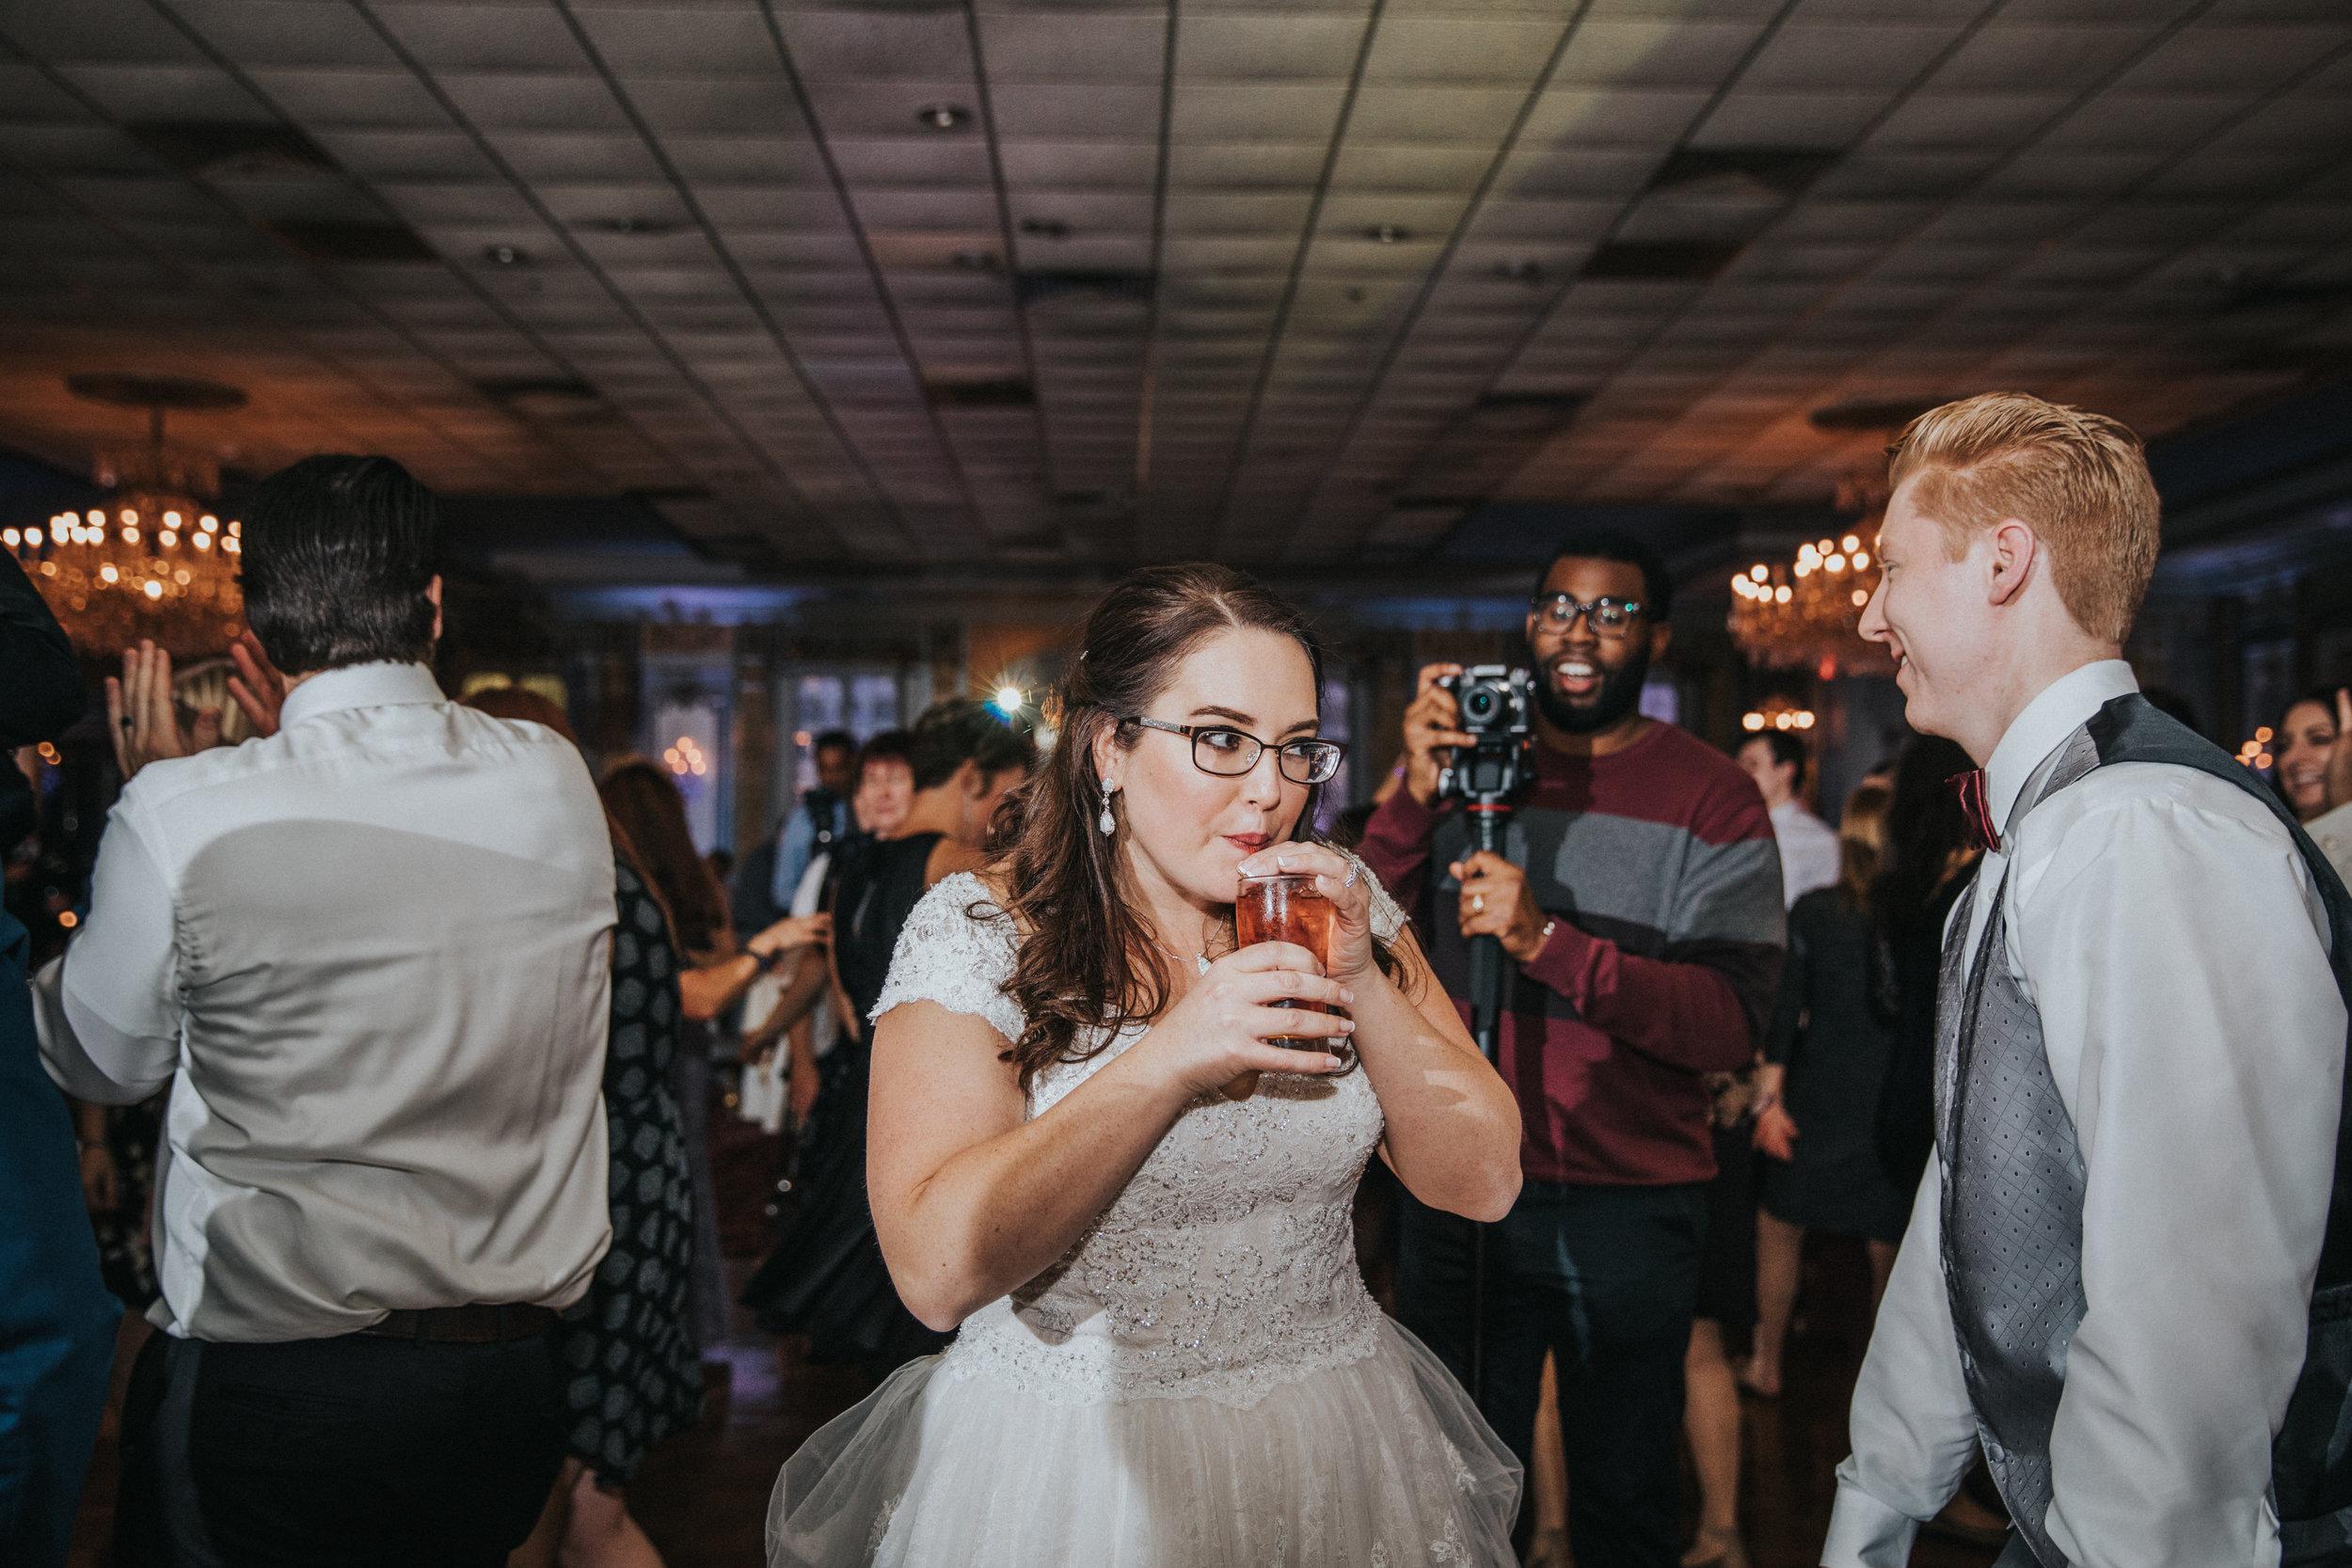 New-Jersey-Wedding-Photography-Fishers-Tudor-House-JennaLynnPhotography-Reception-Kathleen&Eddie-166.jpg